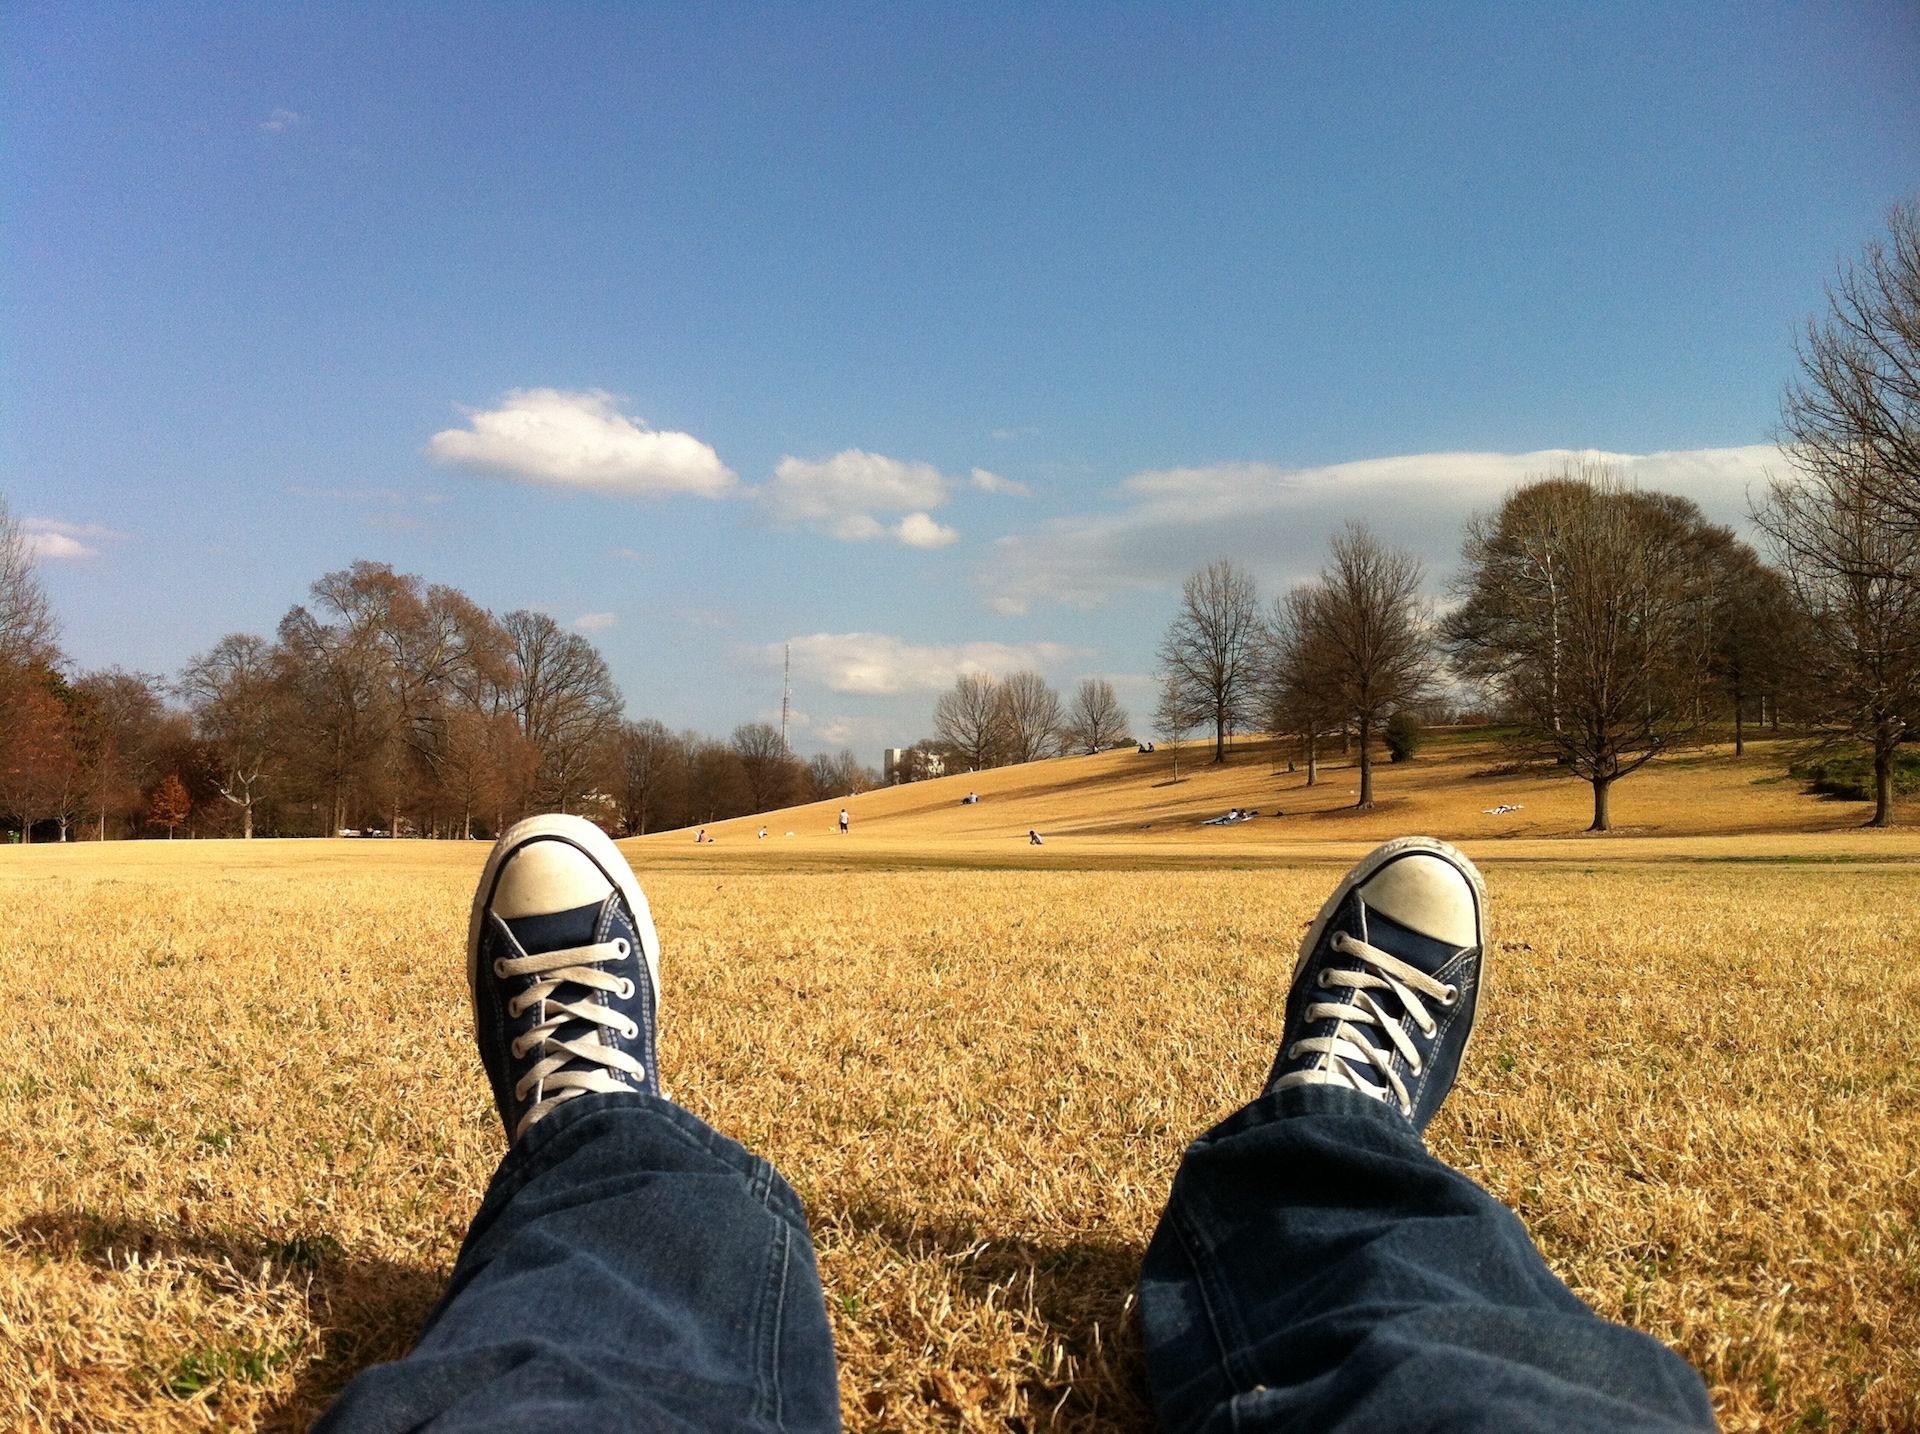 chaussures, reste, Parc, herbe, sec - Fonds d'écran HD - Professor-falken.com